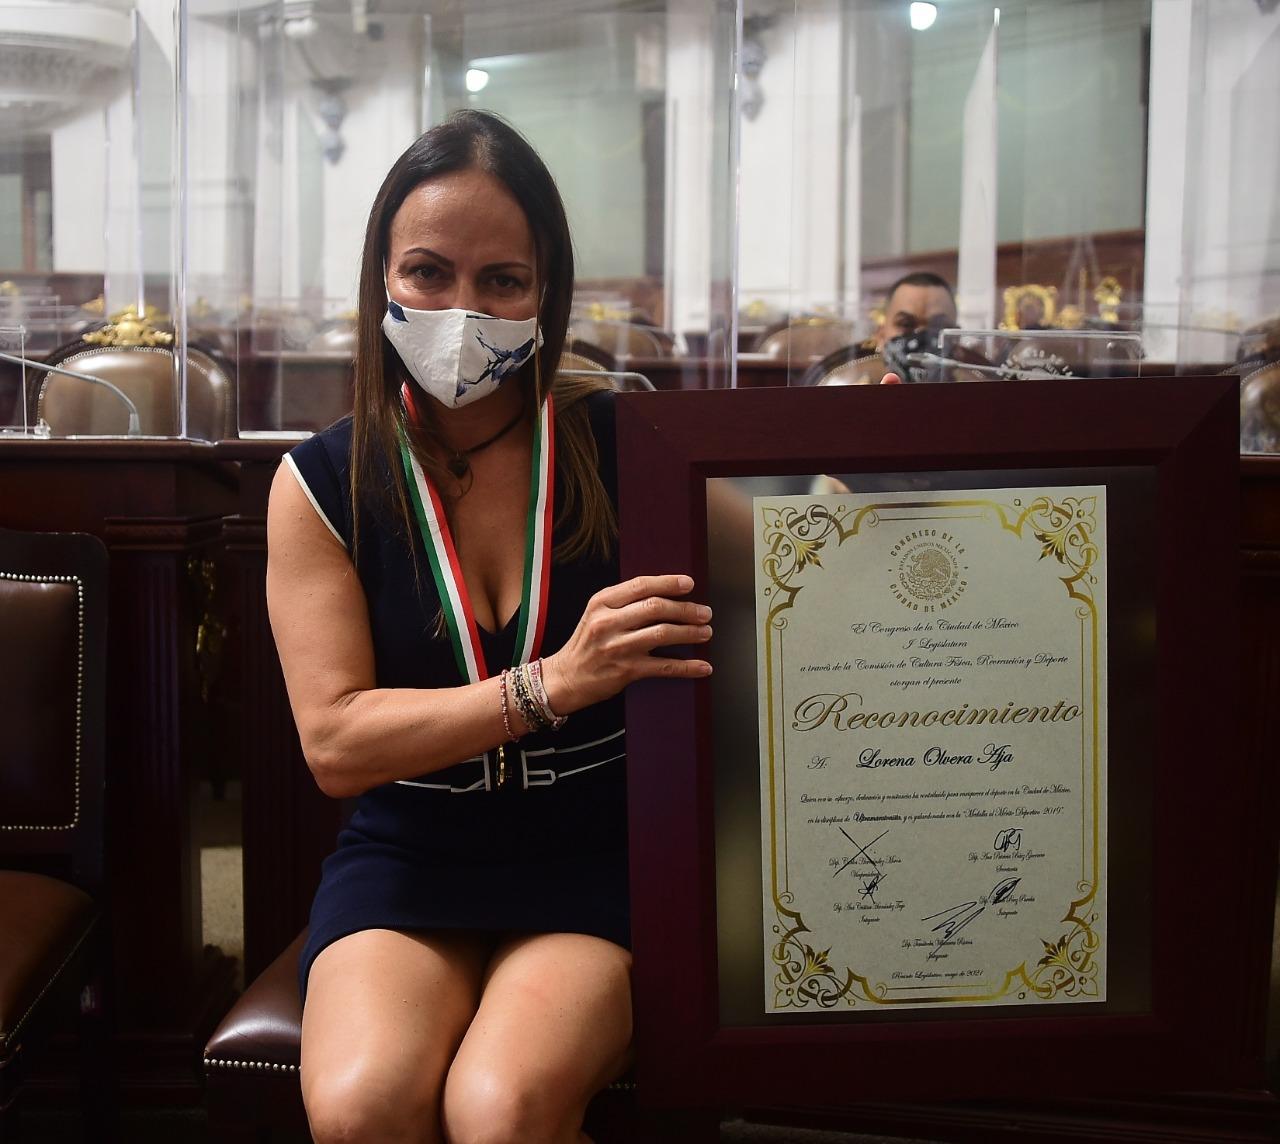 La ultramaratonista Lorena Olvera Aja, recibe Medalla al Mérito Deportivo